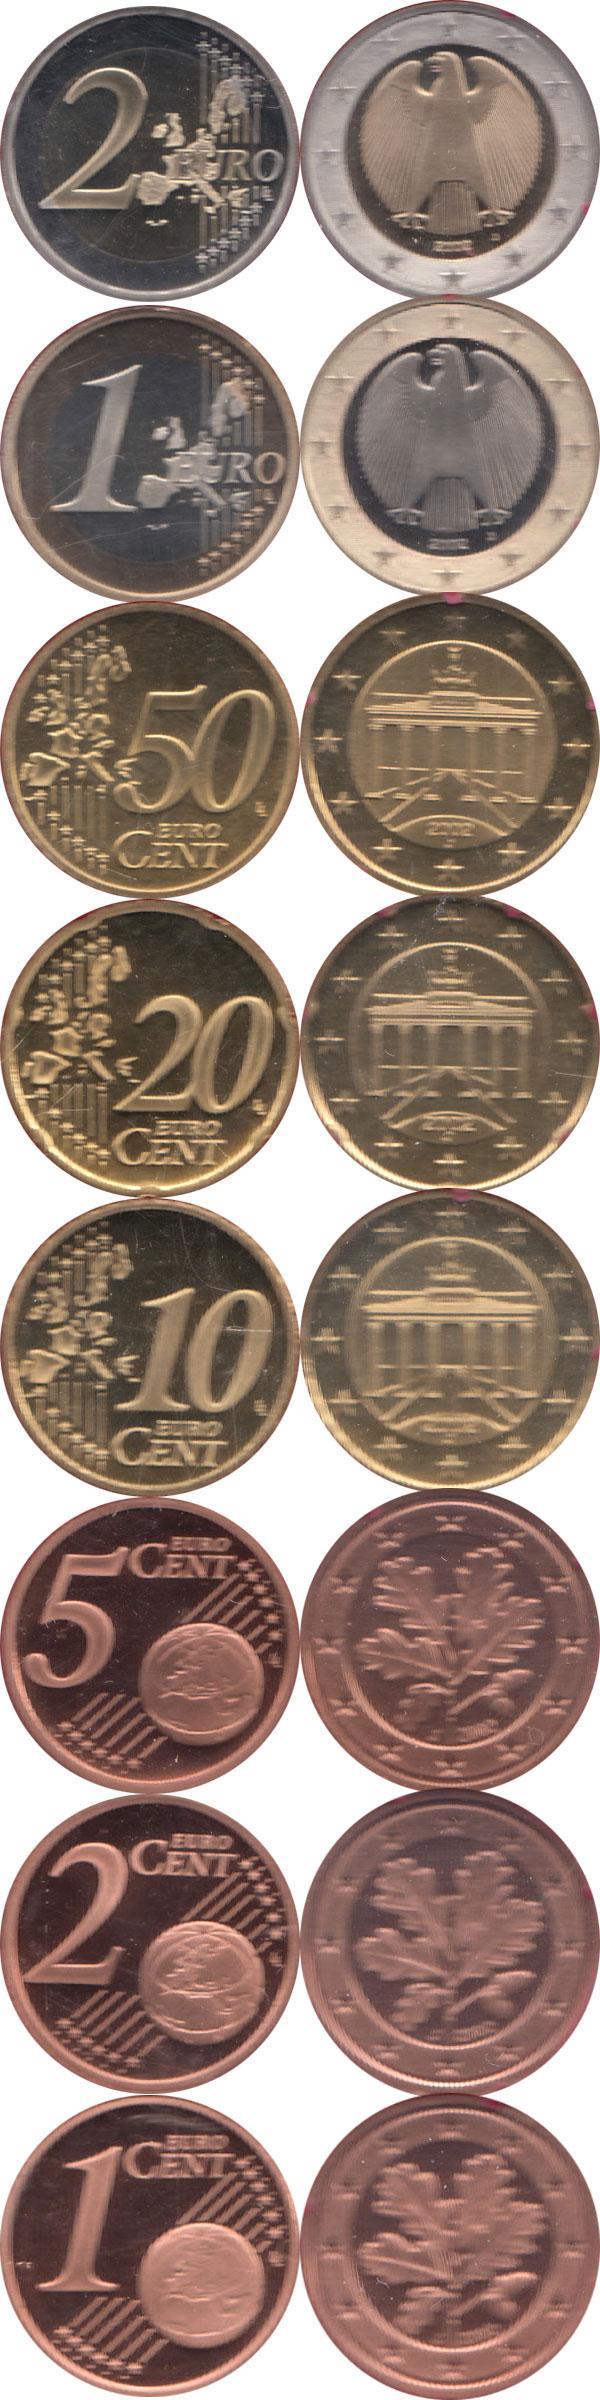 Каталог монет - Германия Выпуск 2002 года, Чеканка Гамбурга